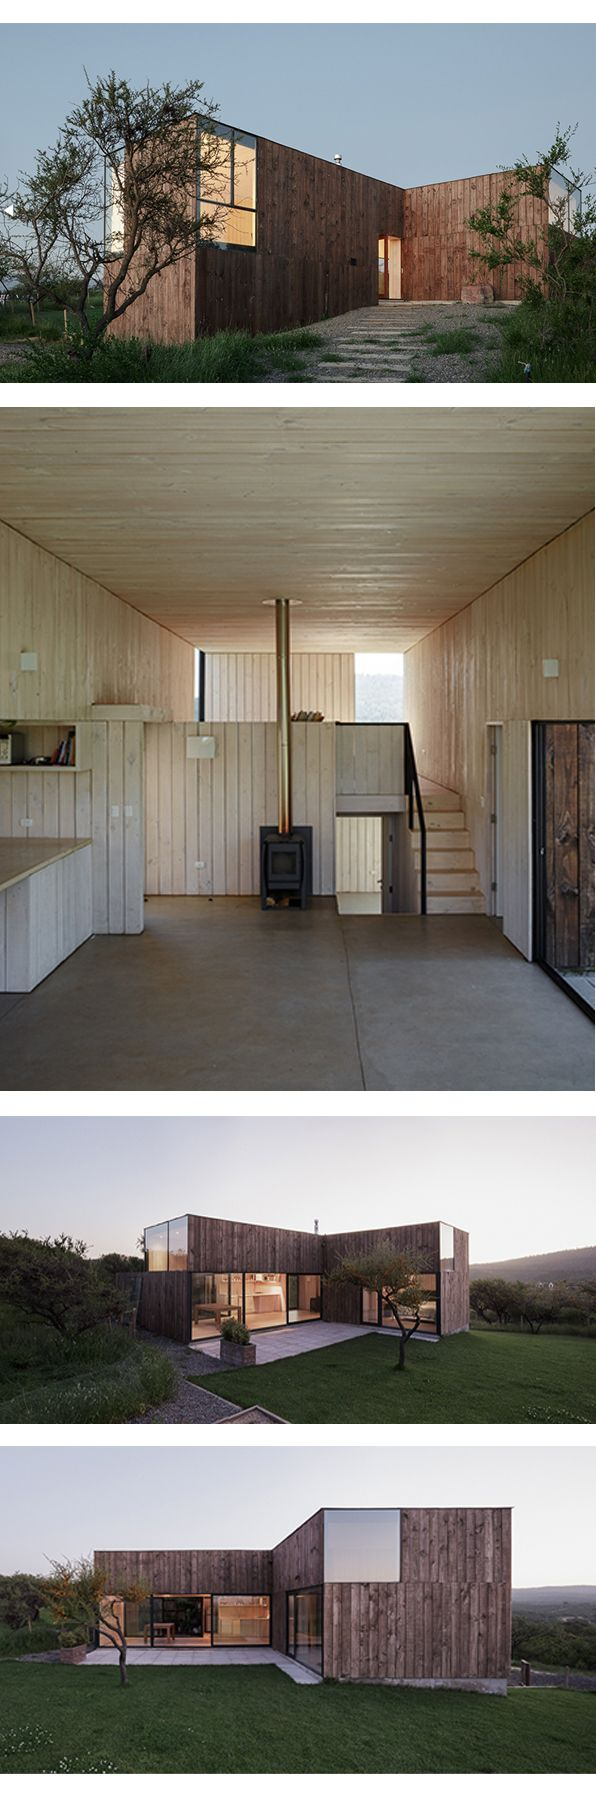 1157 best modular homes images on pinterest | modular homes